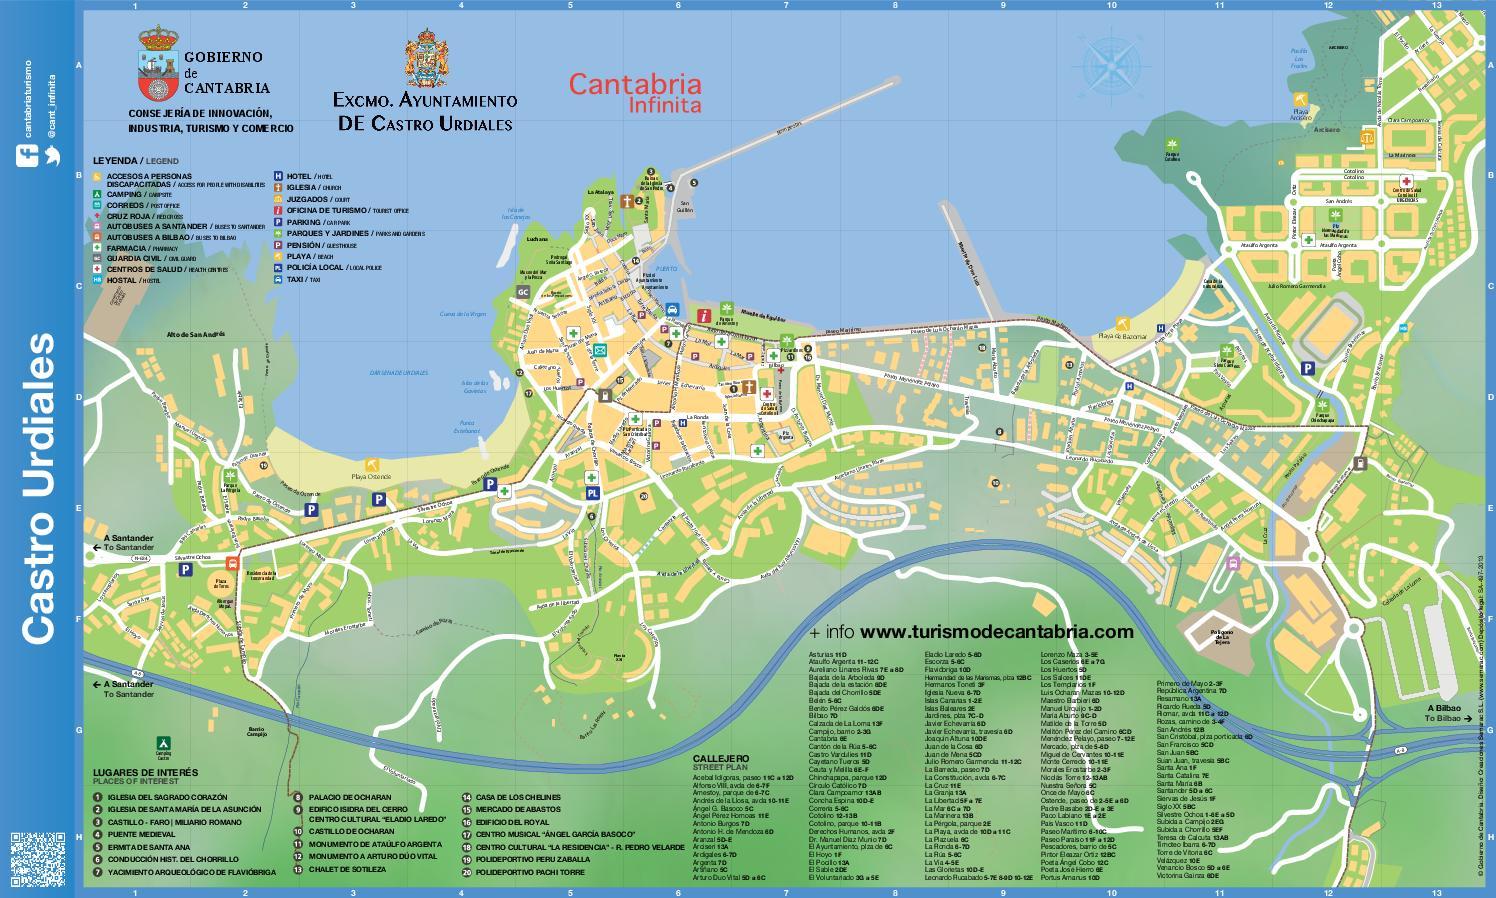 Mapa tur stico de castro urdiales by cantabria turismo issuu for Mapa santander sucursales